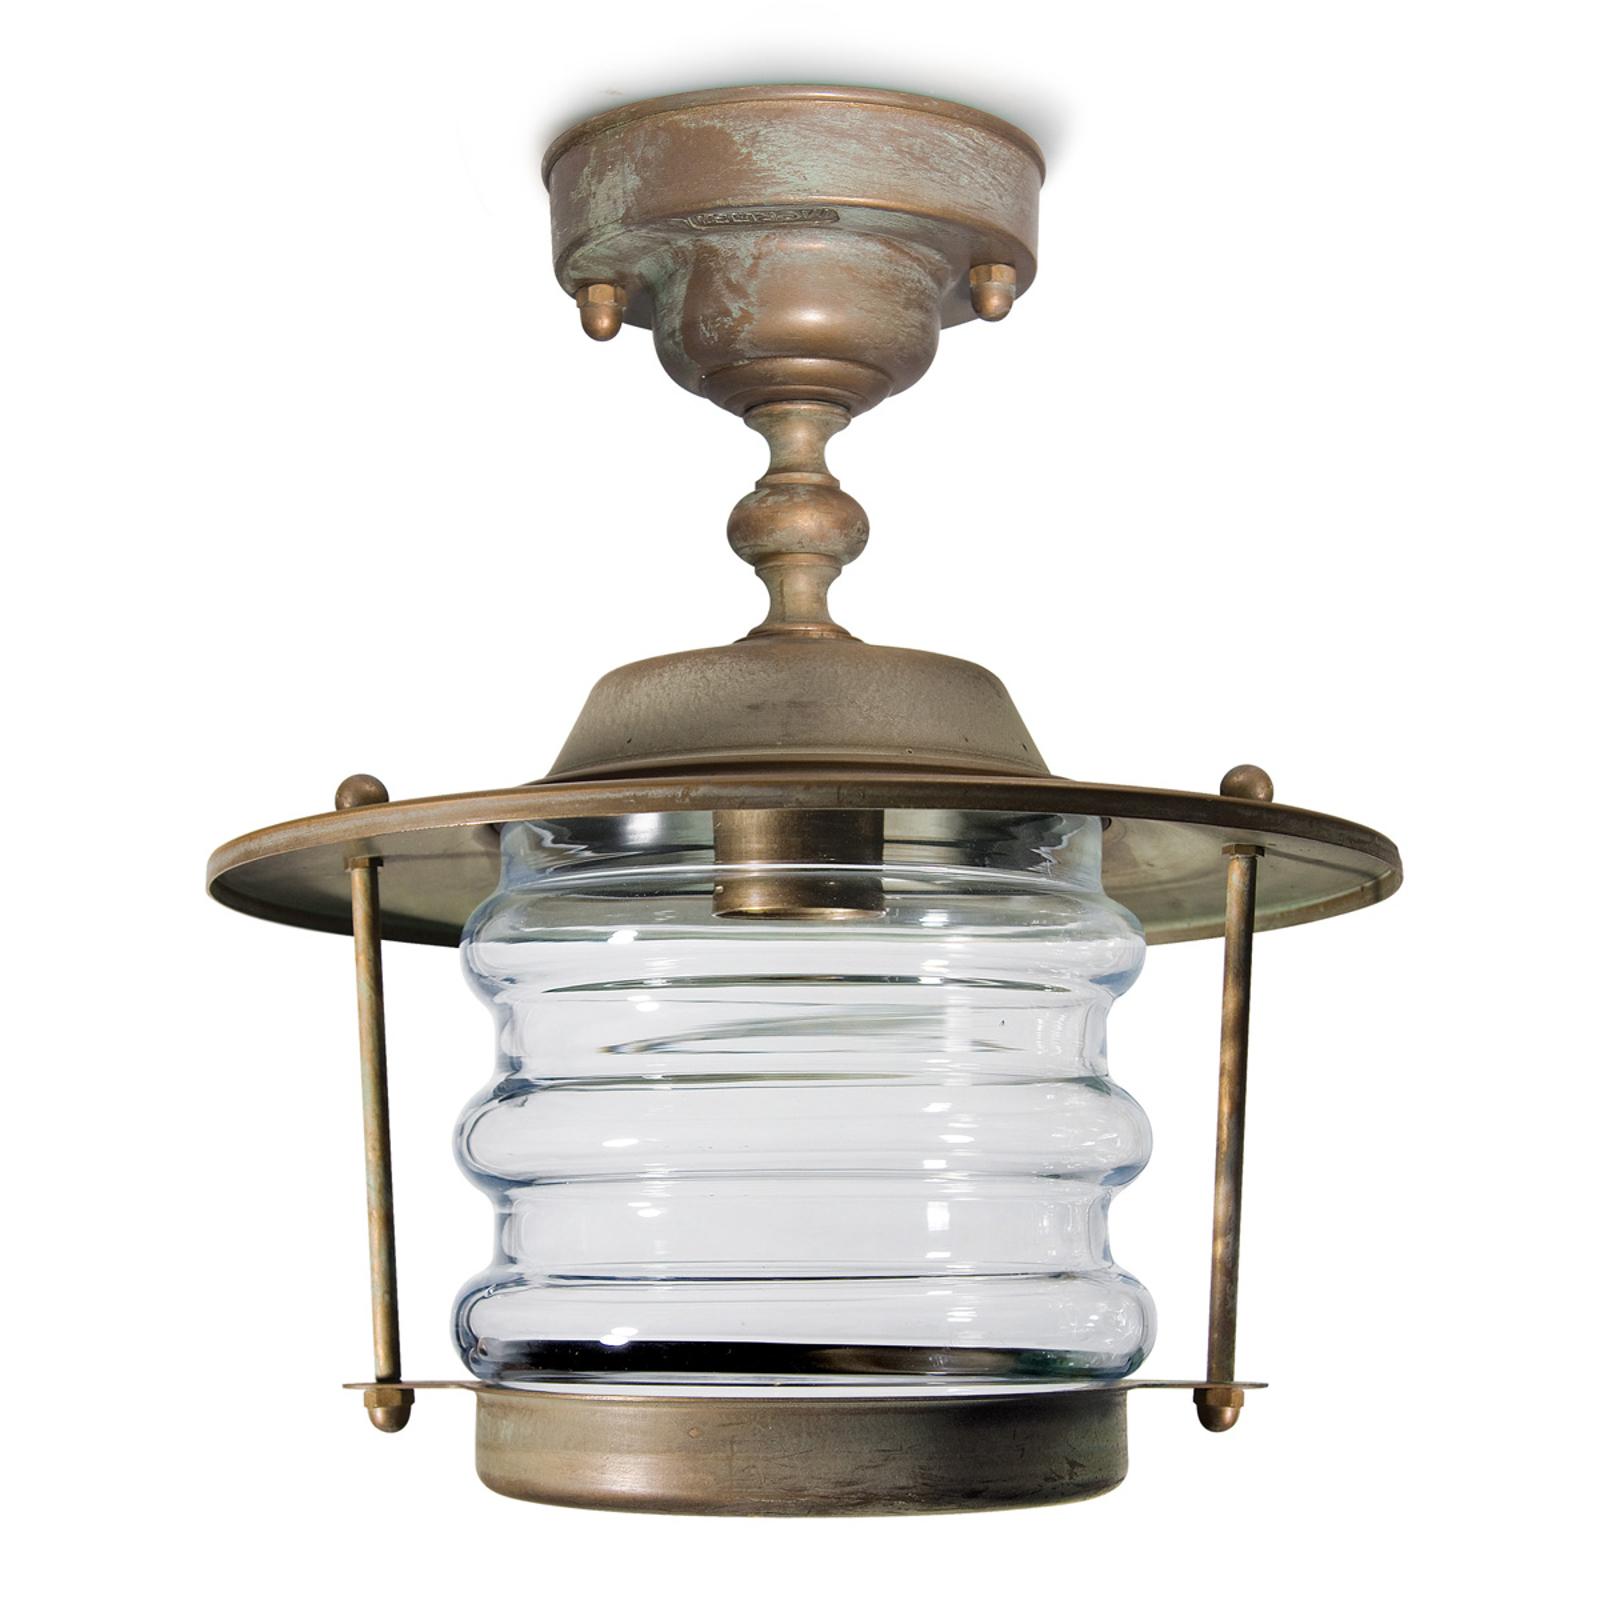 Adessora-ulkokattolamppu, merivedenkest. Ø 22,5 cm